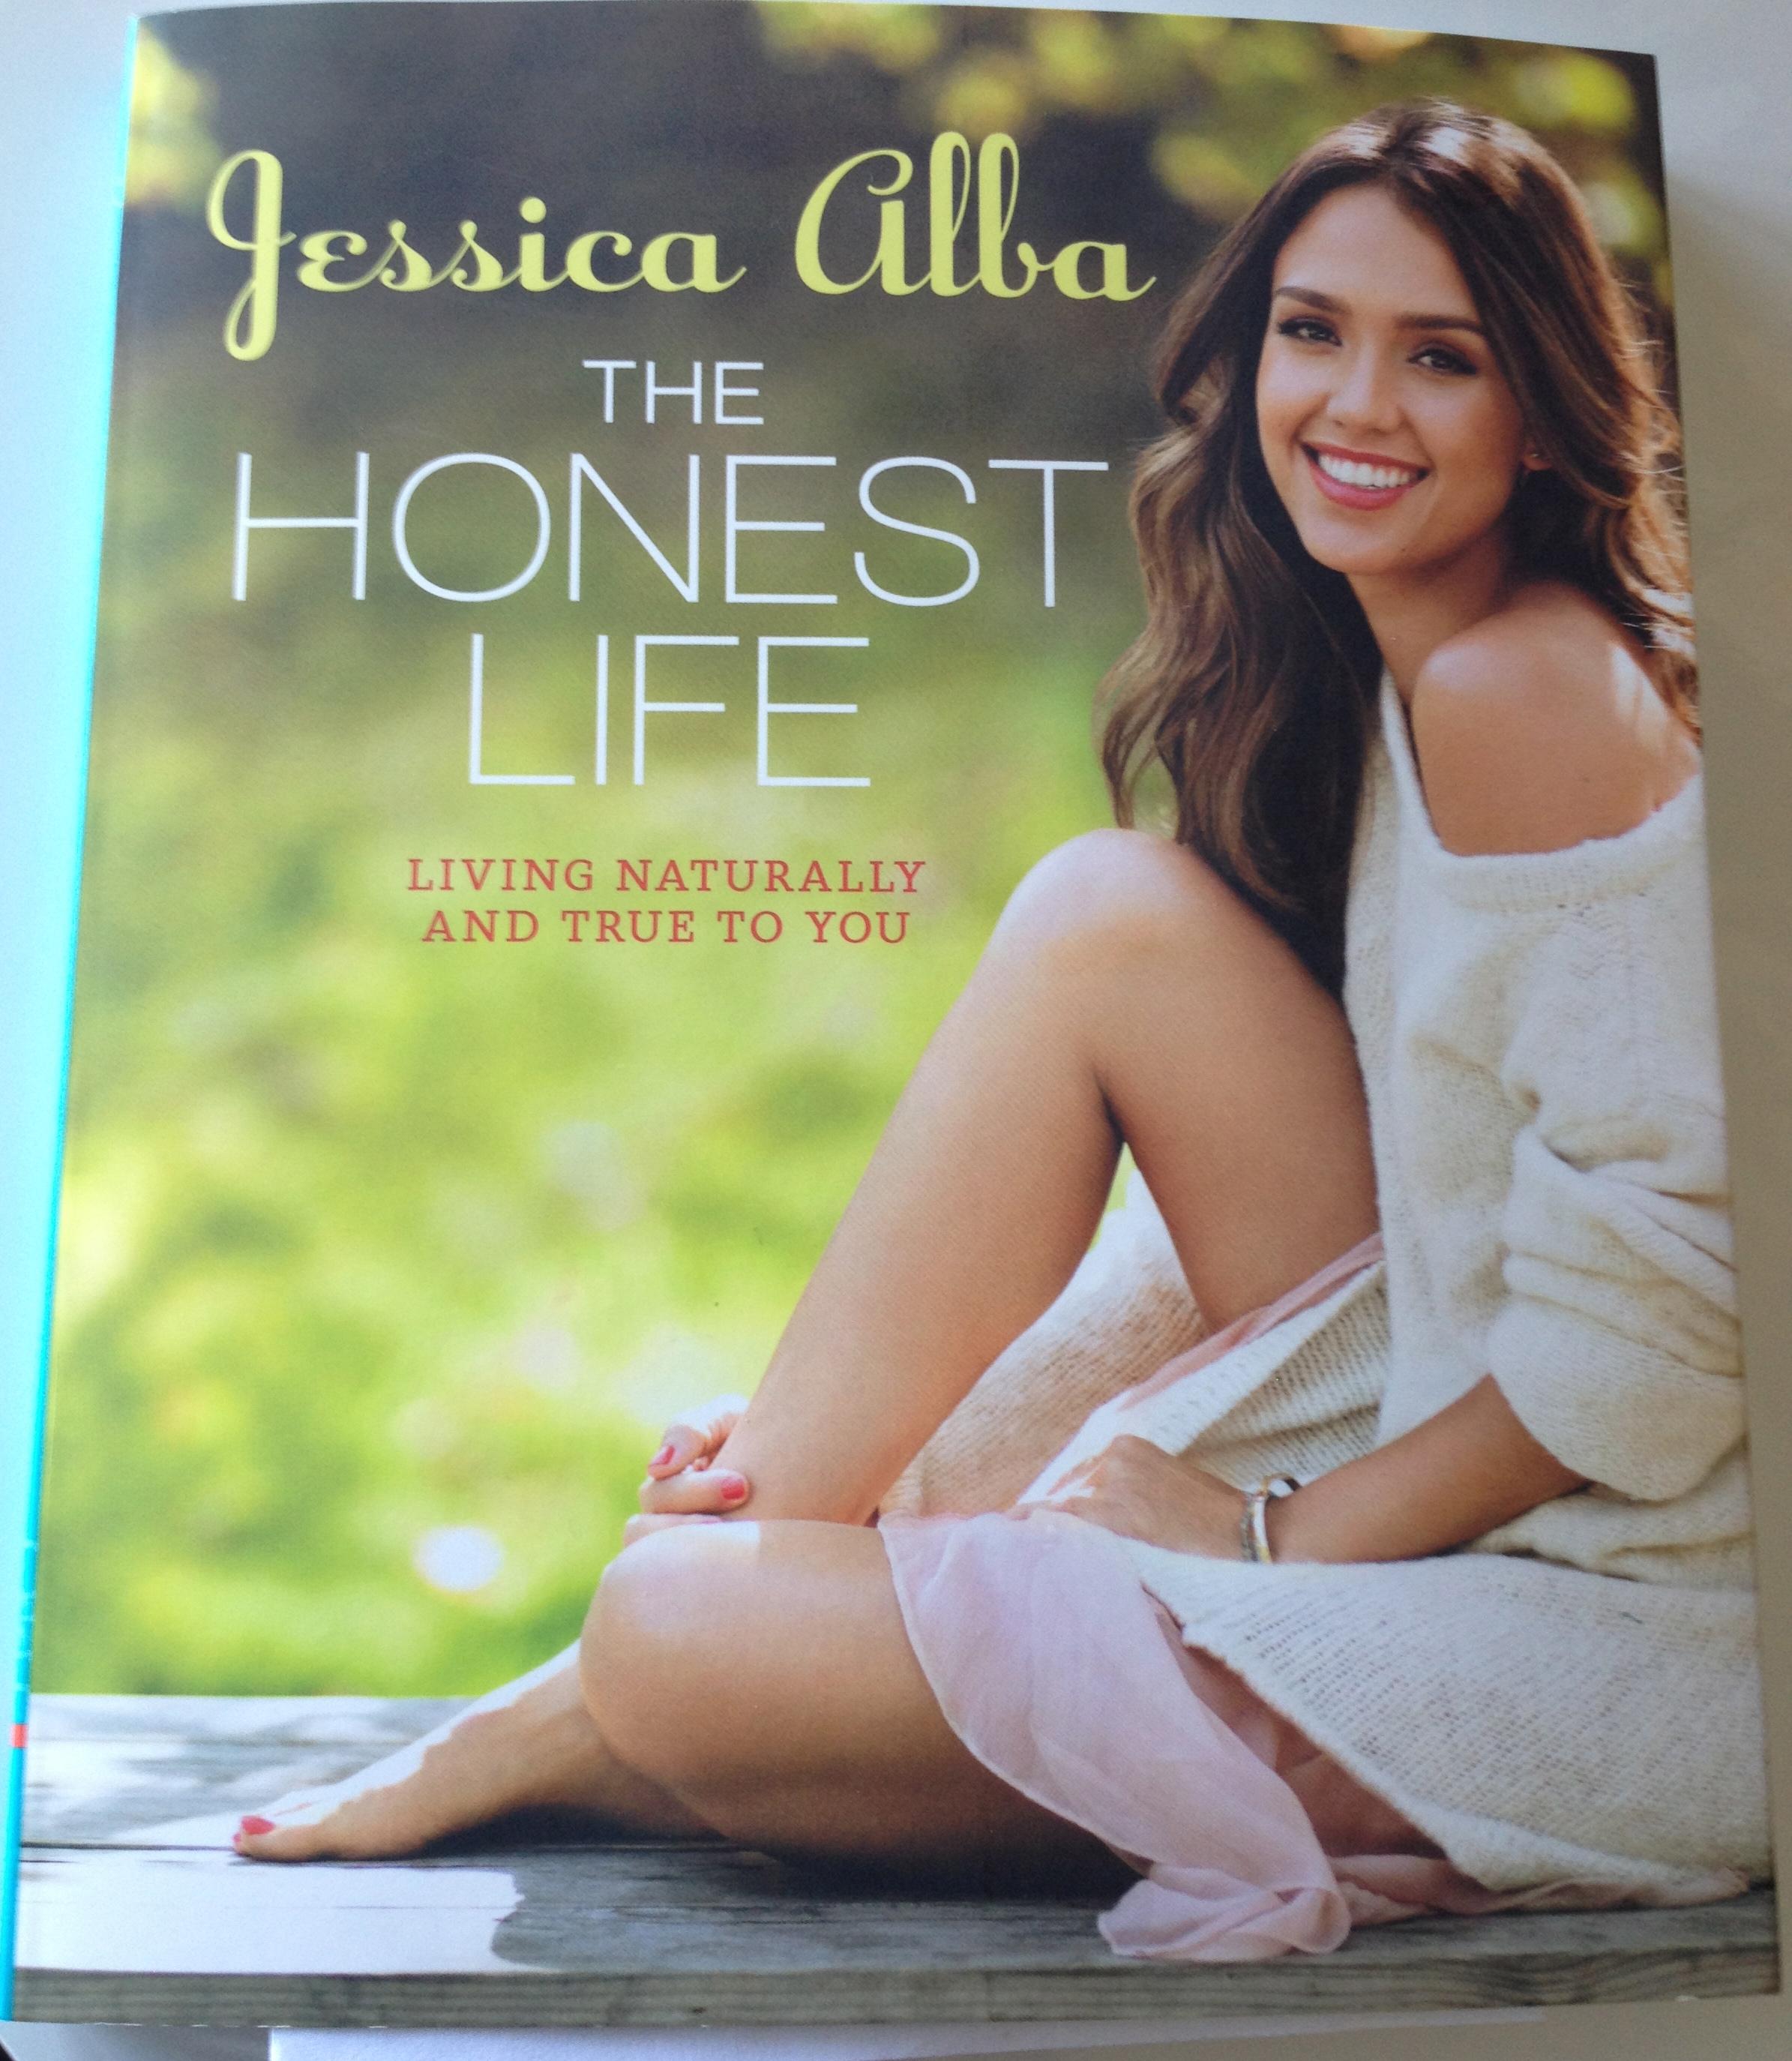 Order Jessica Alba's book  here!